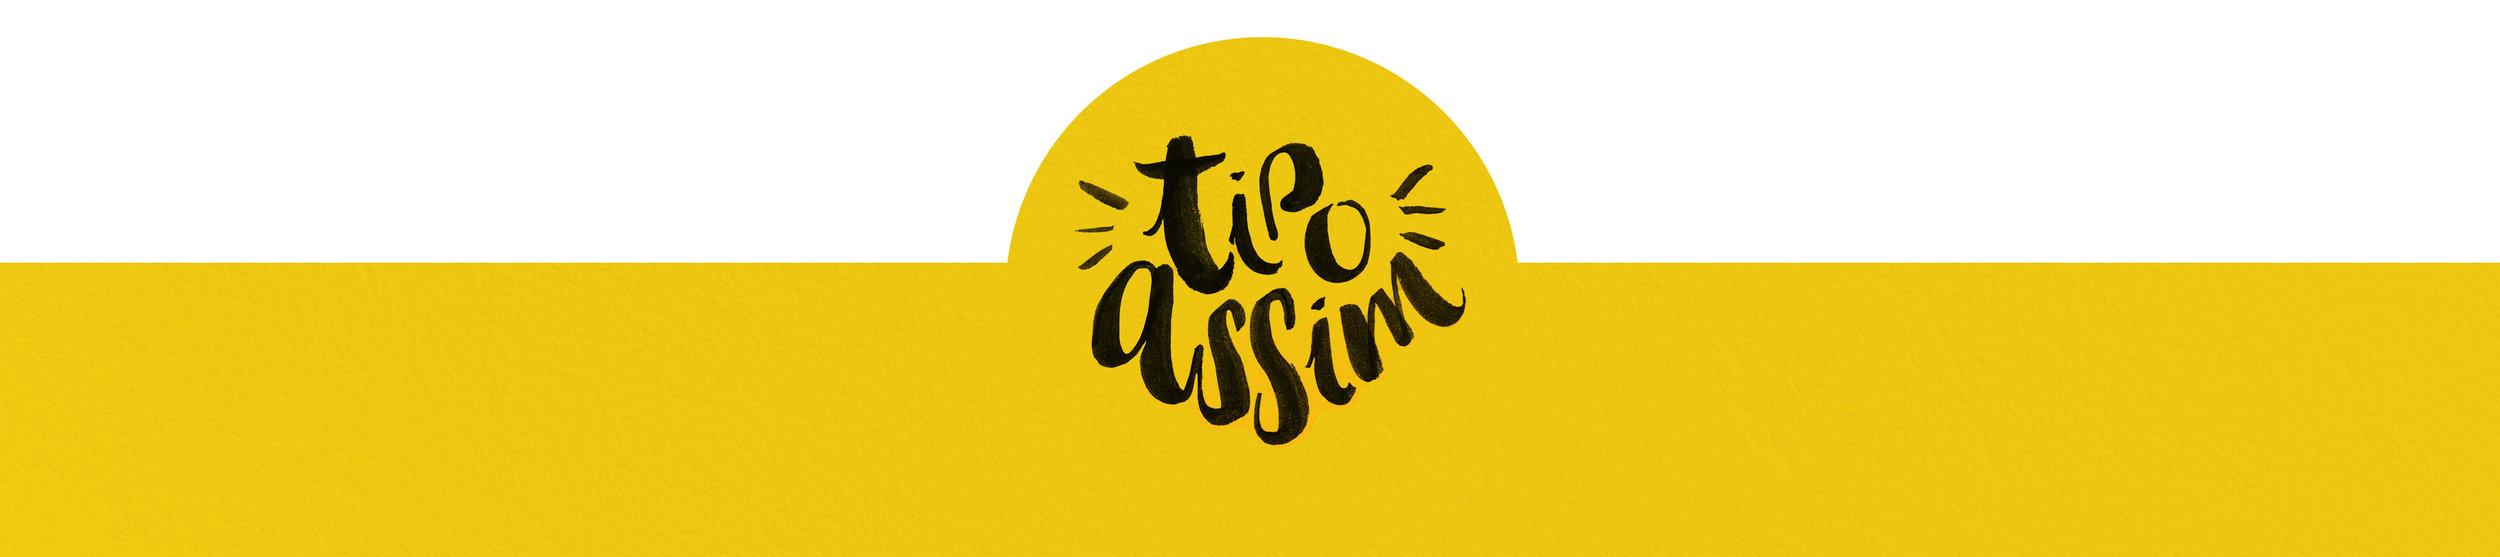 TIPOASSIM_Tarja superior.jpg